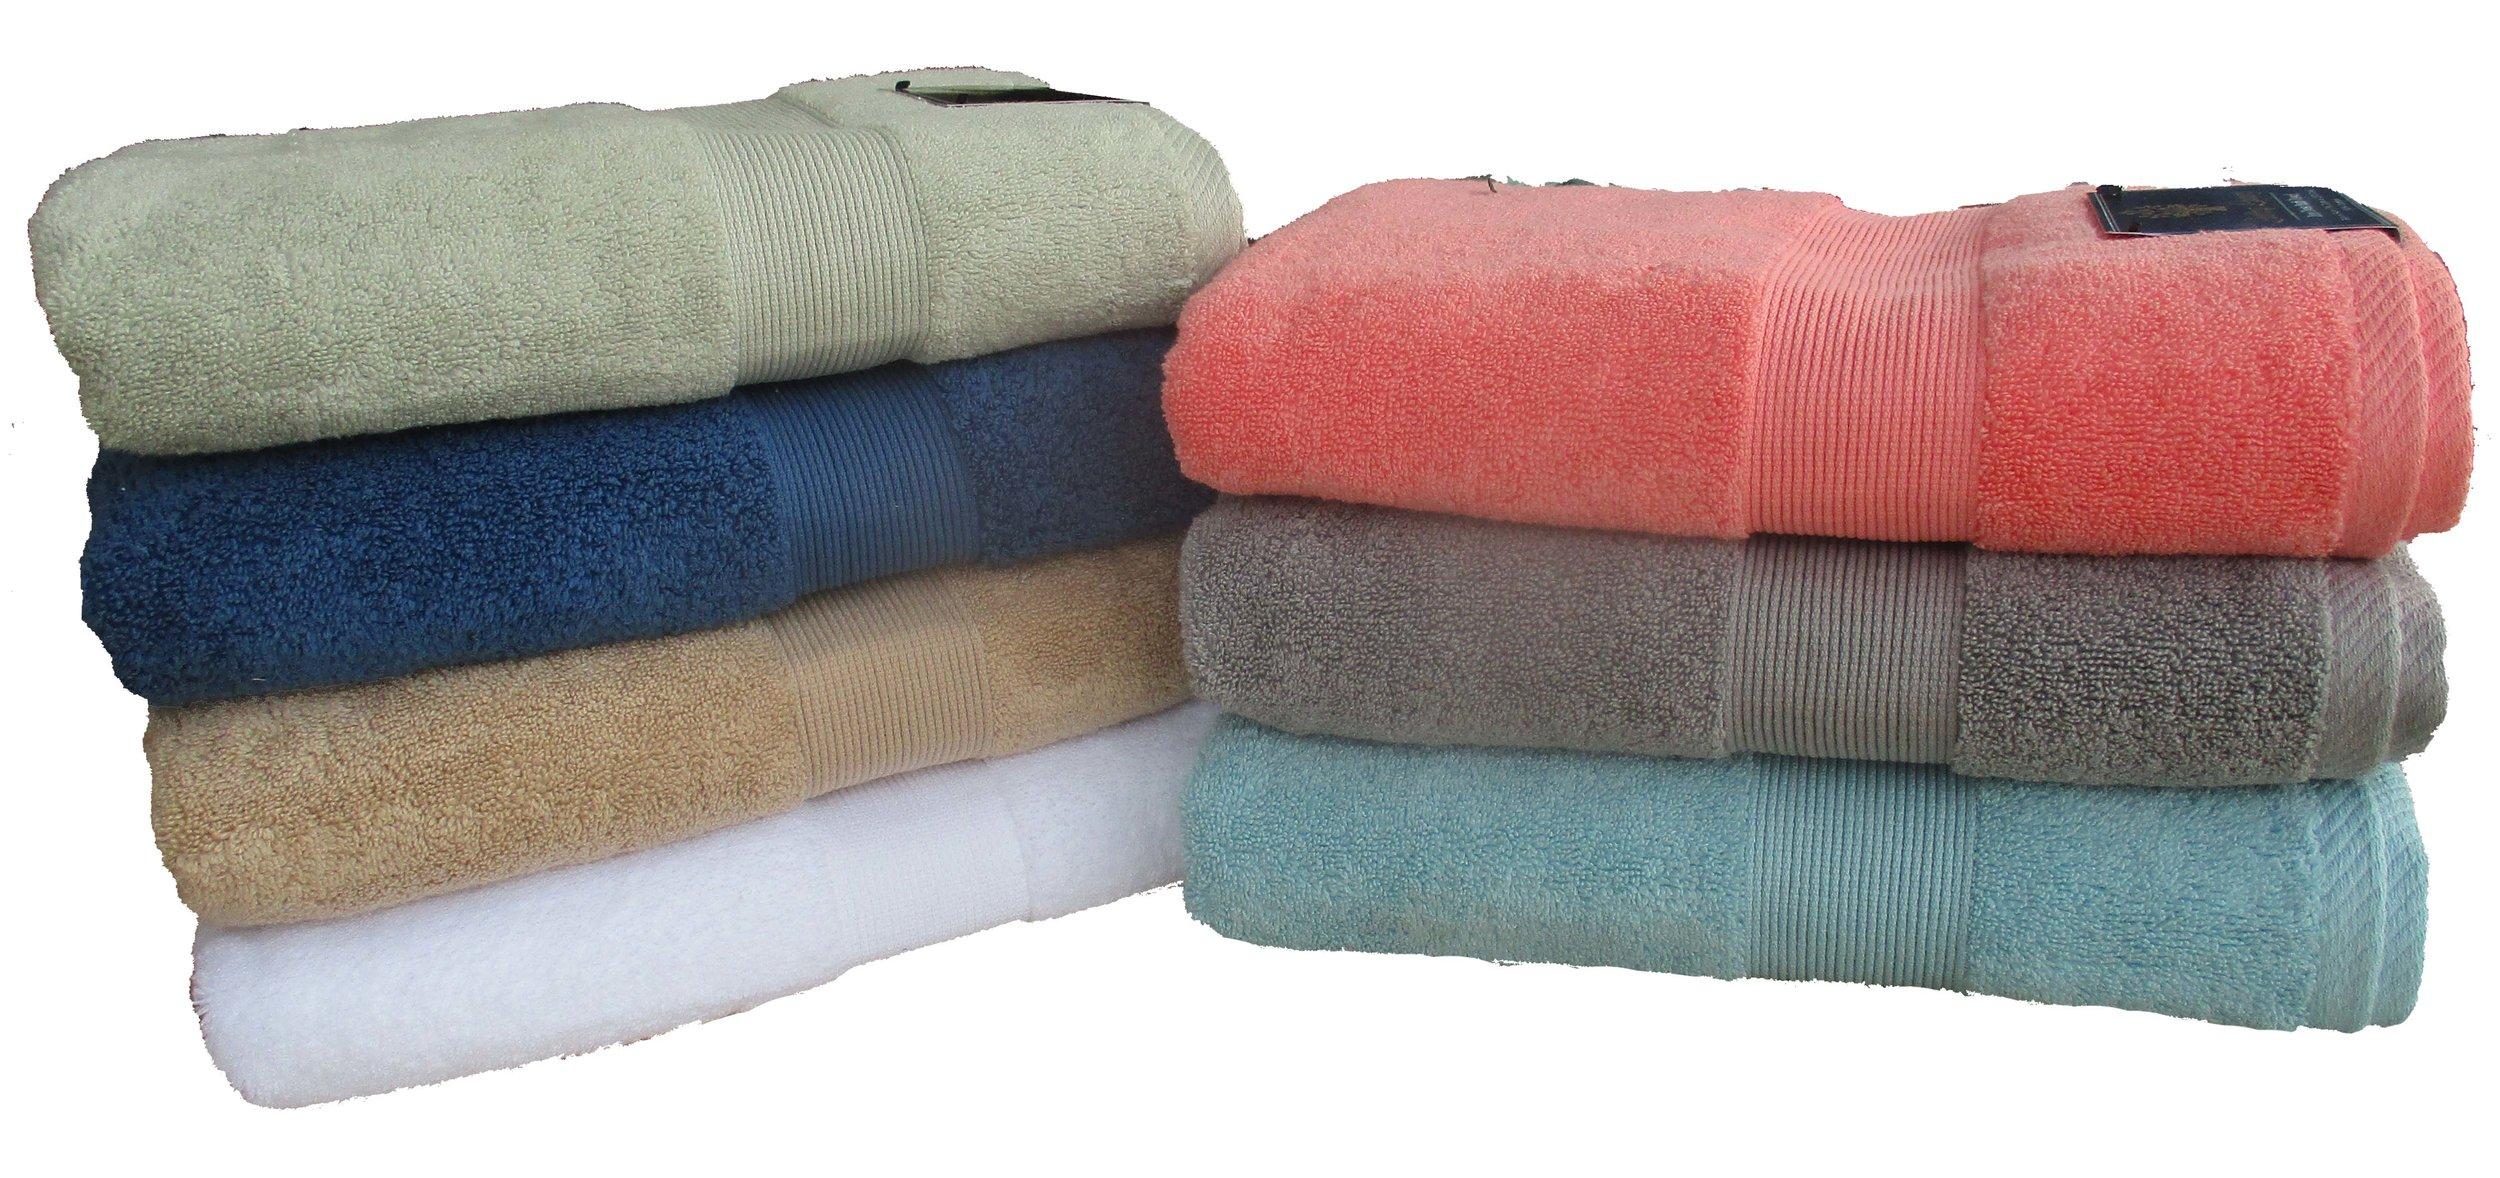 Double Ply Bath Towels